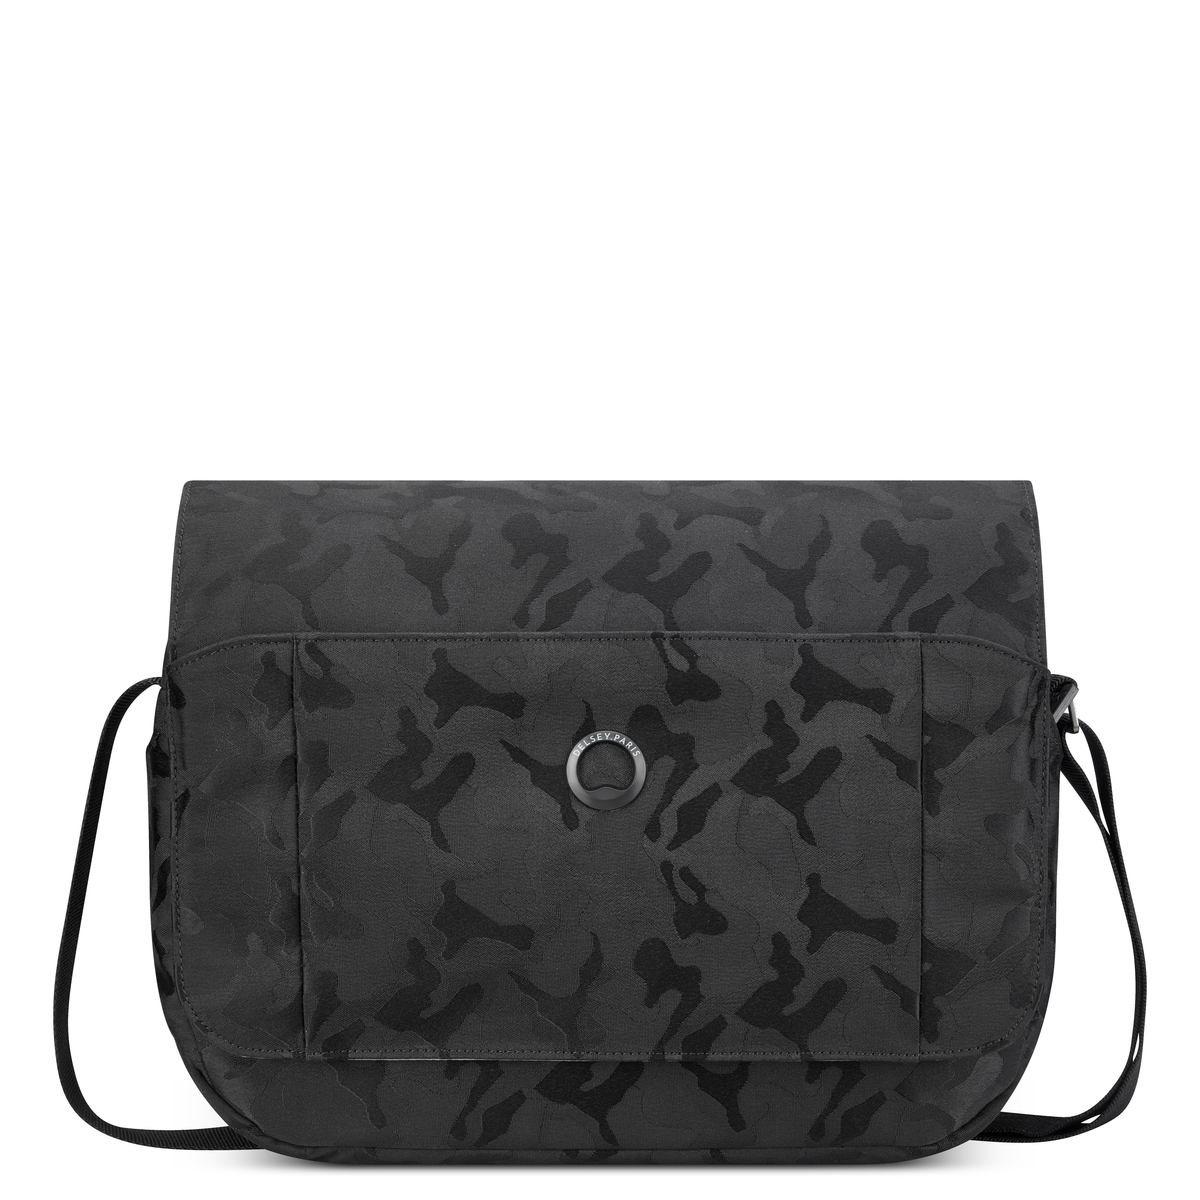 Delsey Χαρτοφύλακας 26x34,5x9cm με θέση για tablet 12,9'' σειρά Picpus Black Camouflage